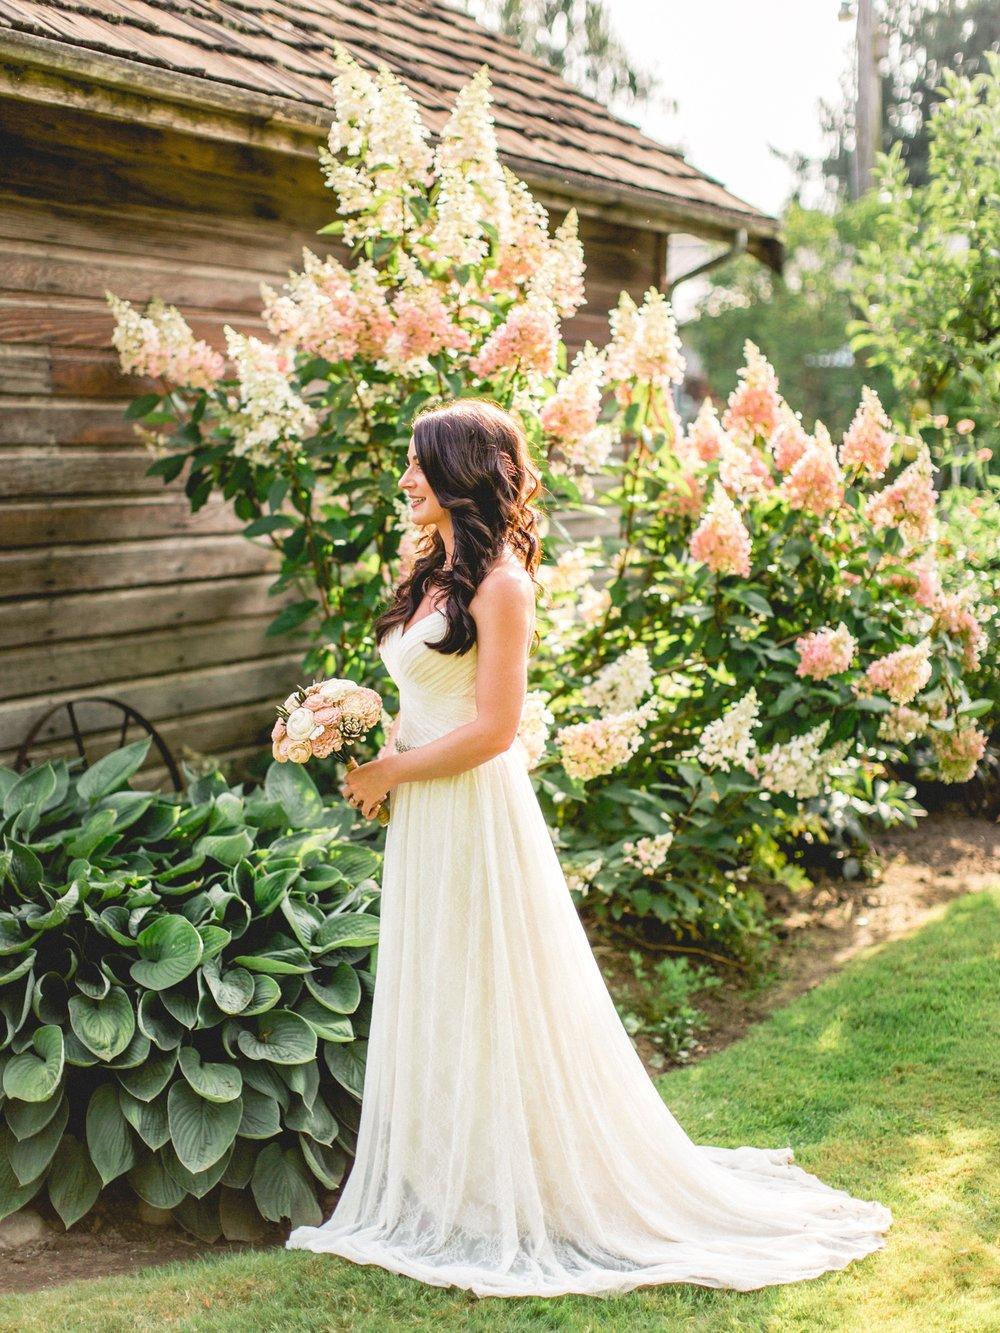 Rhianna-Mercier-Photography-Seattle-Wedding-Photography-7799.jpg